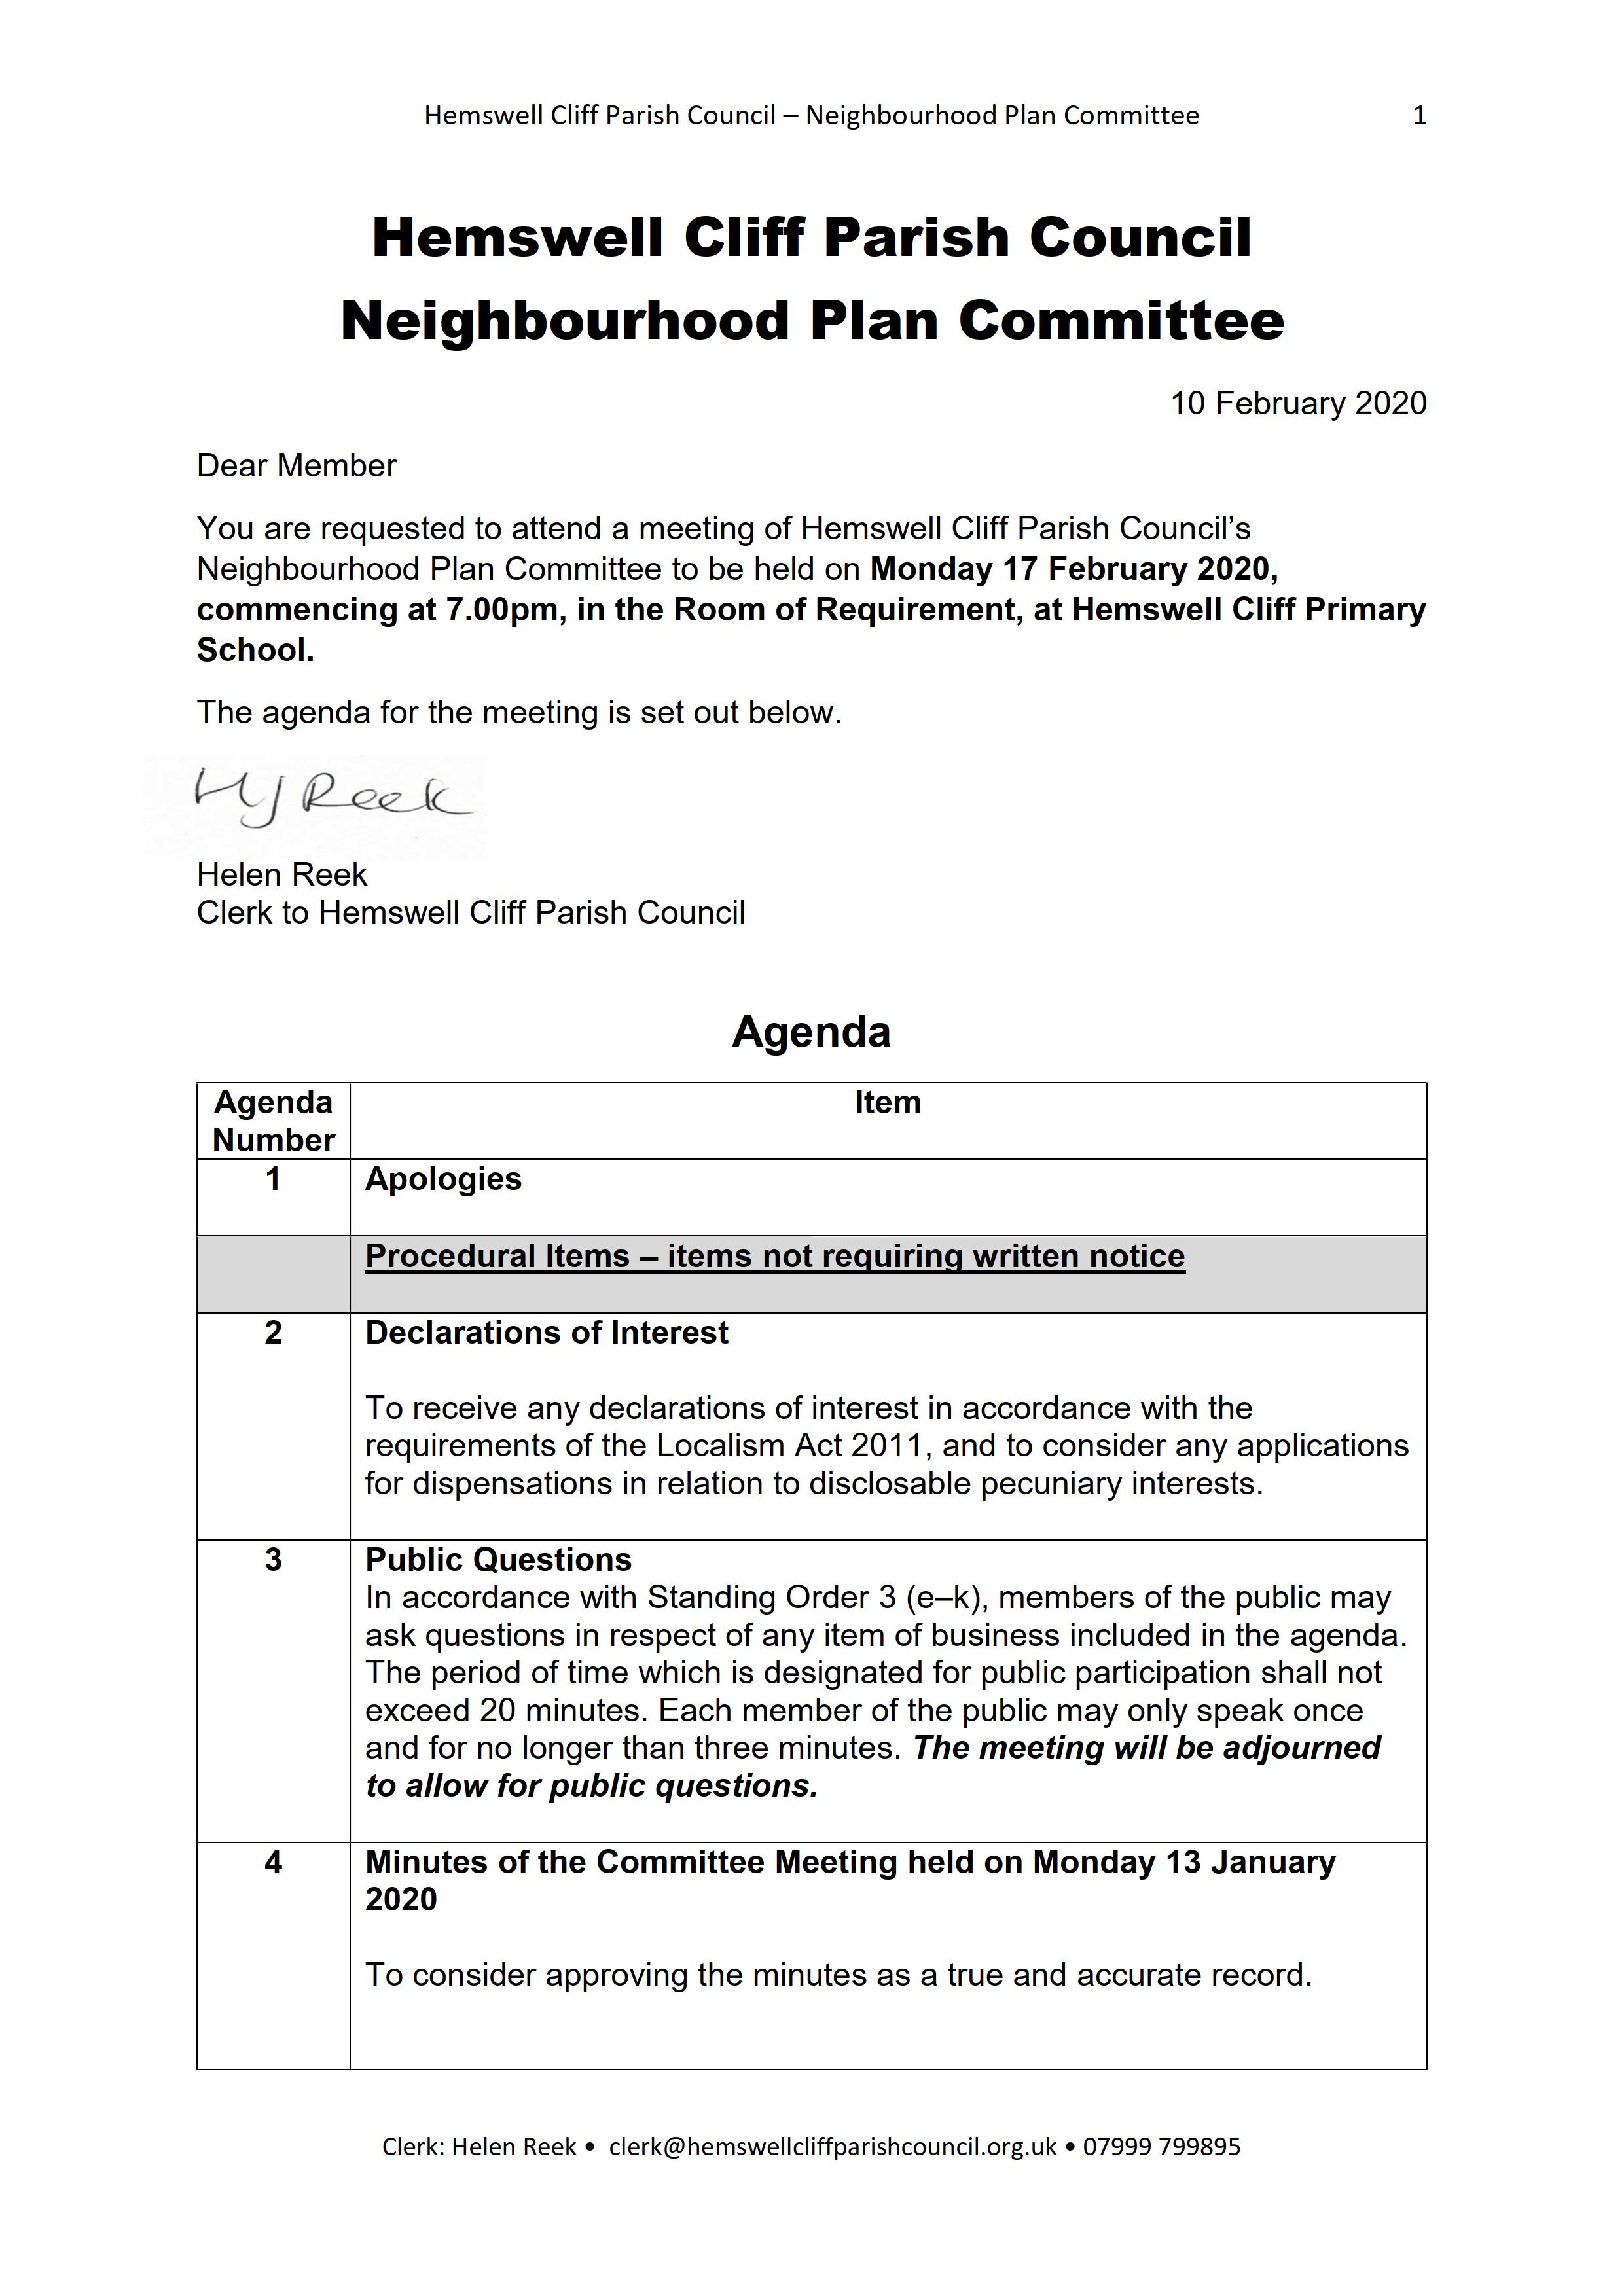 HCPC_NPC_Agenda_17.02.20_1.png